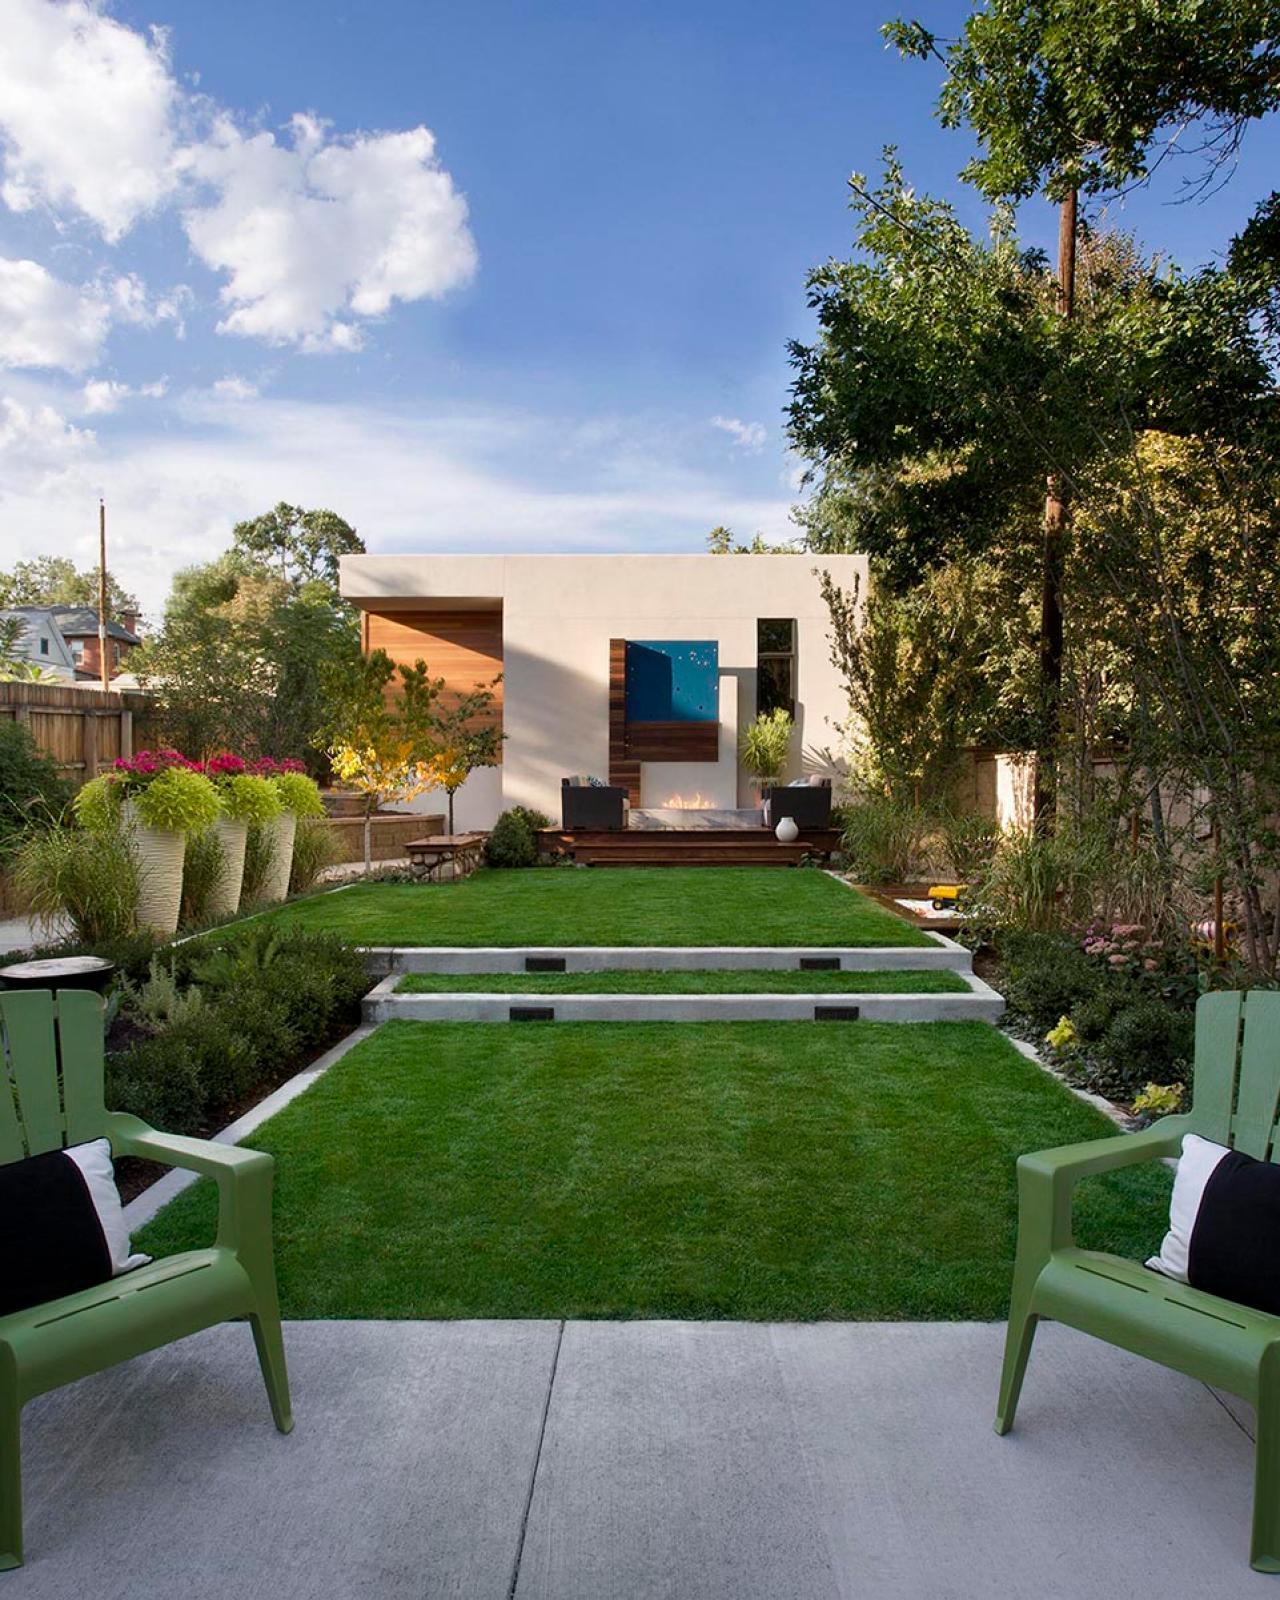 Hgtv Garden Design Ideas: Photo Page